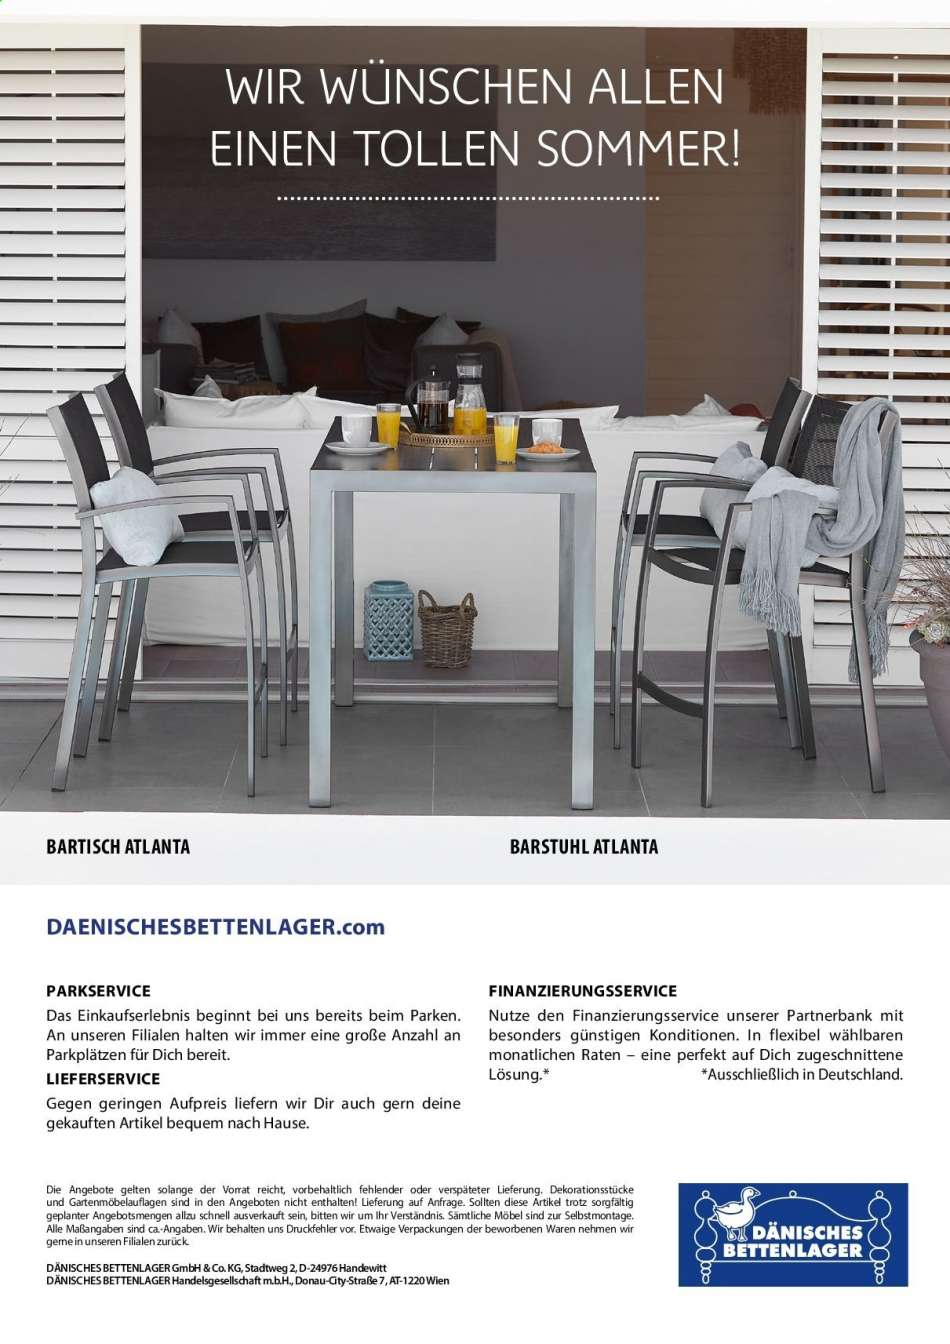 Full Size of Dänisches Bettenlager Bartisch Dnisches Aktuelle Prospekte Rabatt Kompass Badezimmer Küche Wohnzimmer Dänisches Bettenlager Bartisch